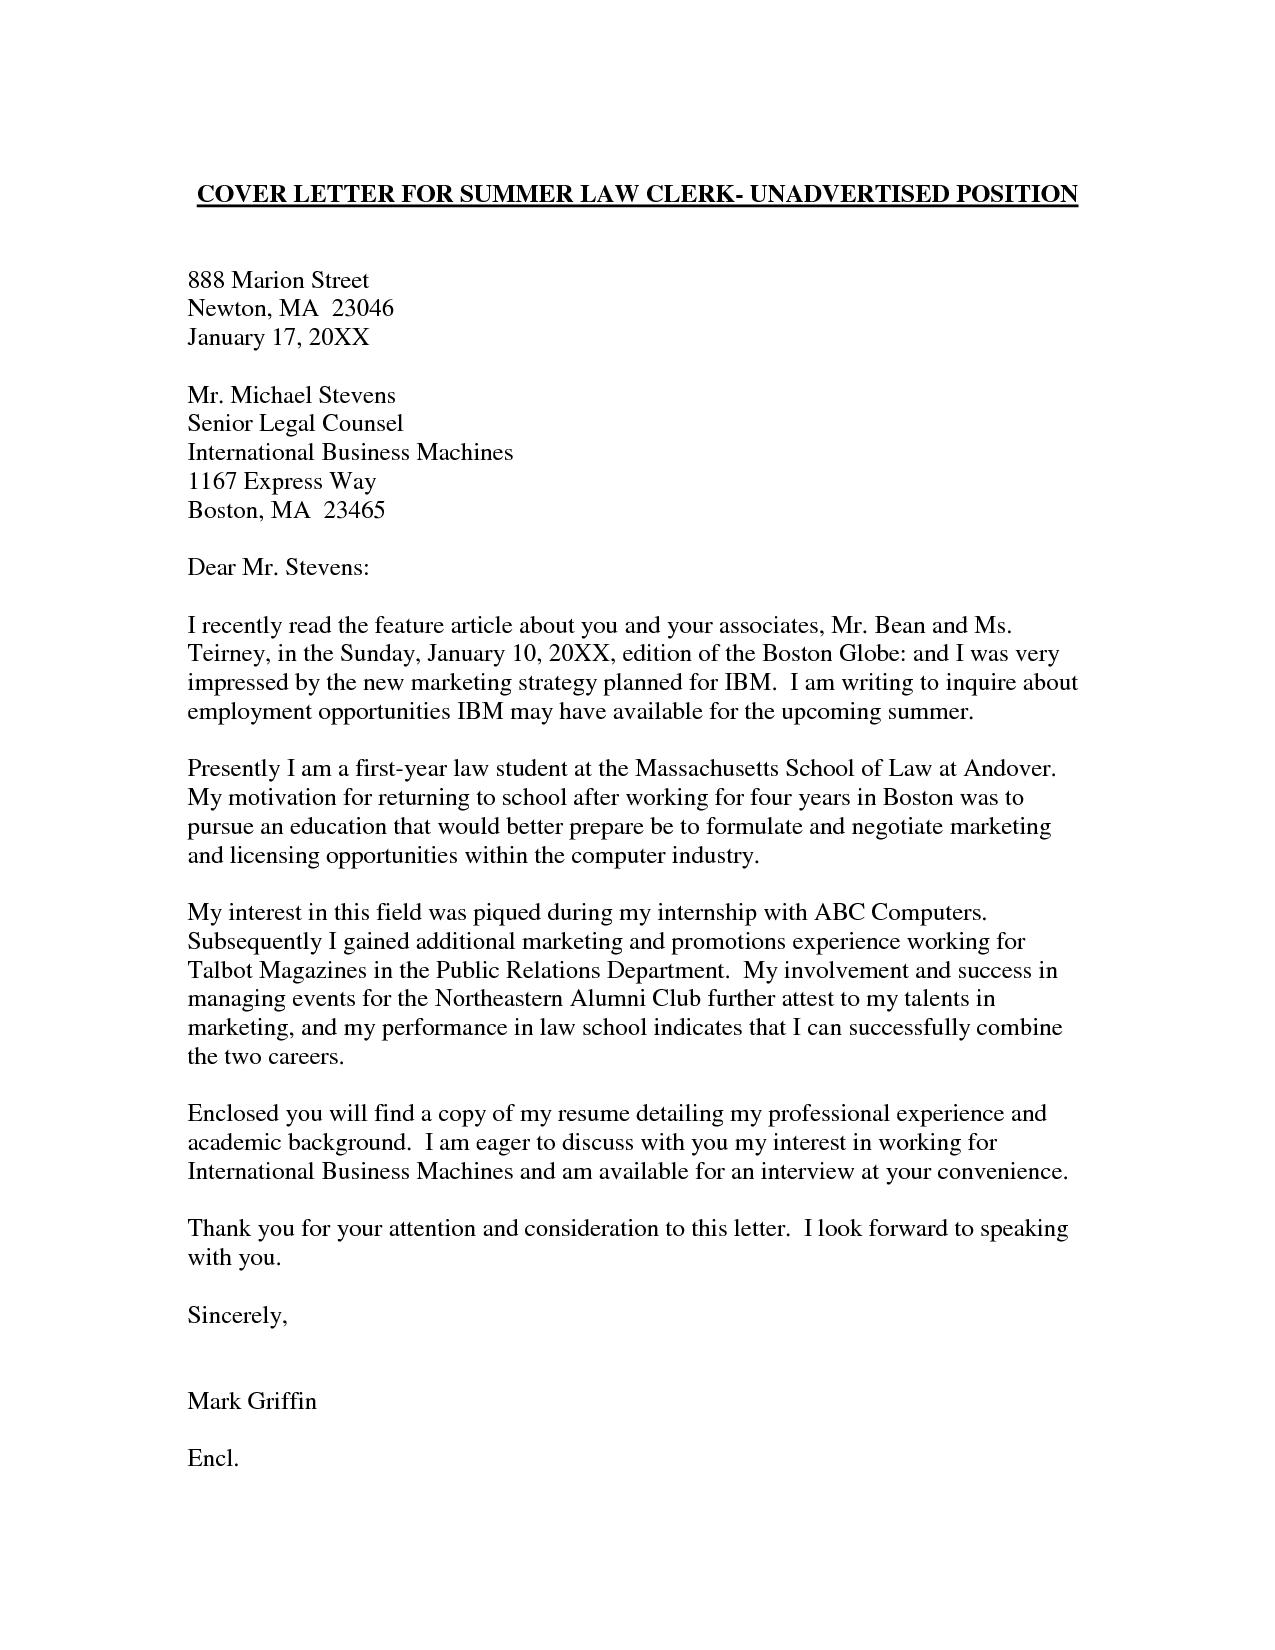 Cover Letter Template Student Employment Kiat Belajar Belajar